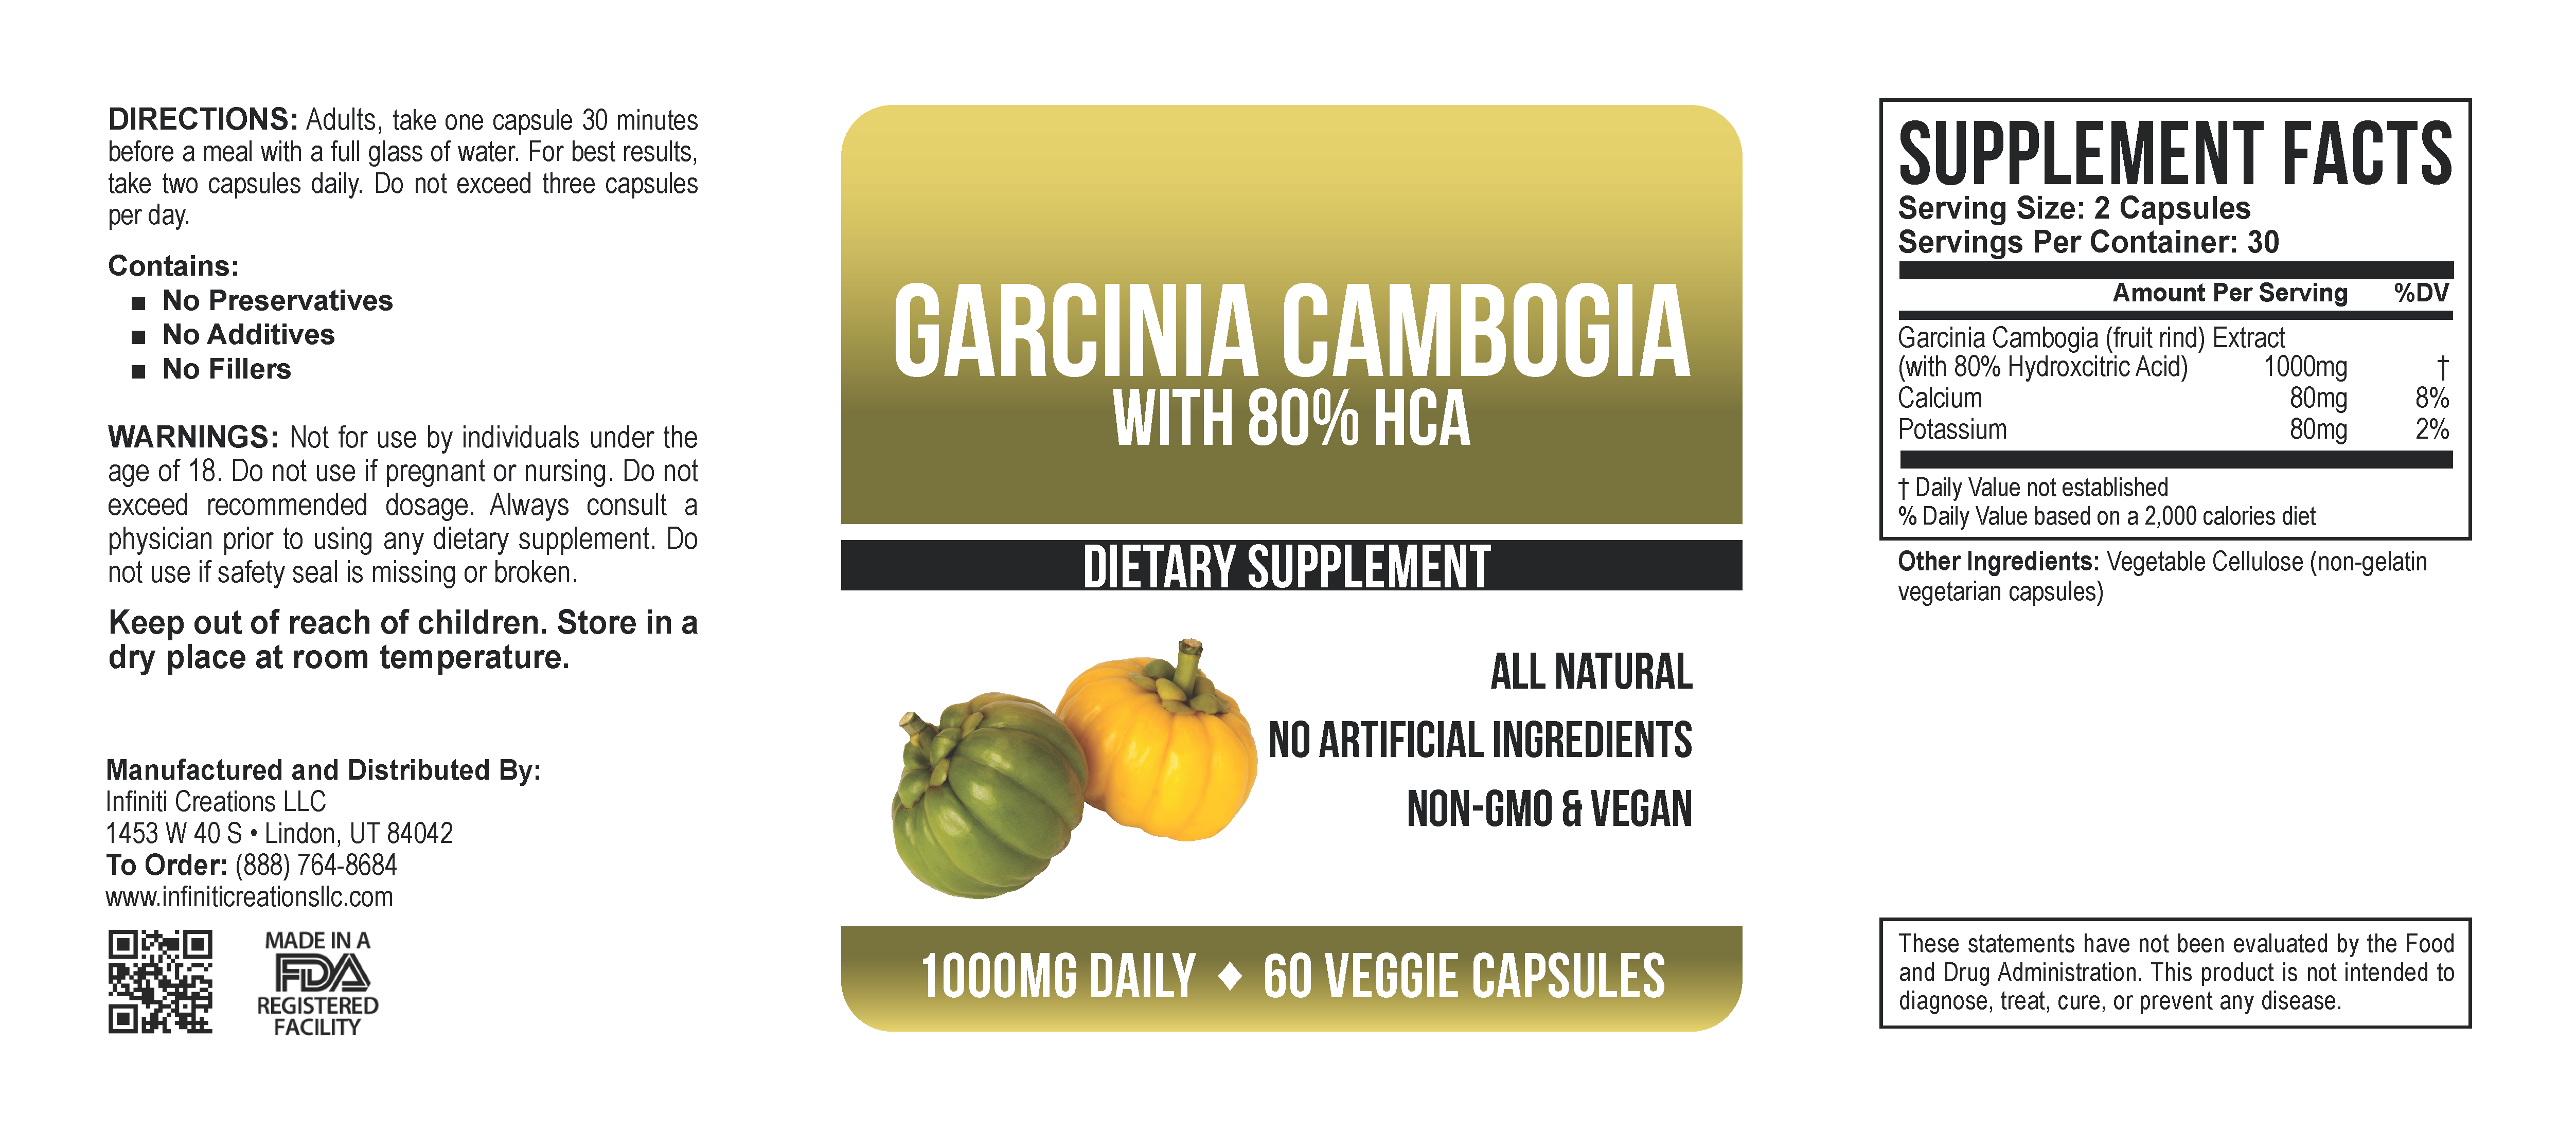 infiniti-creations-garcinia-cambogia-80-60ct-v2.png